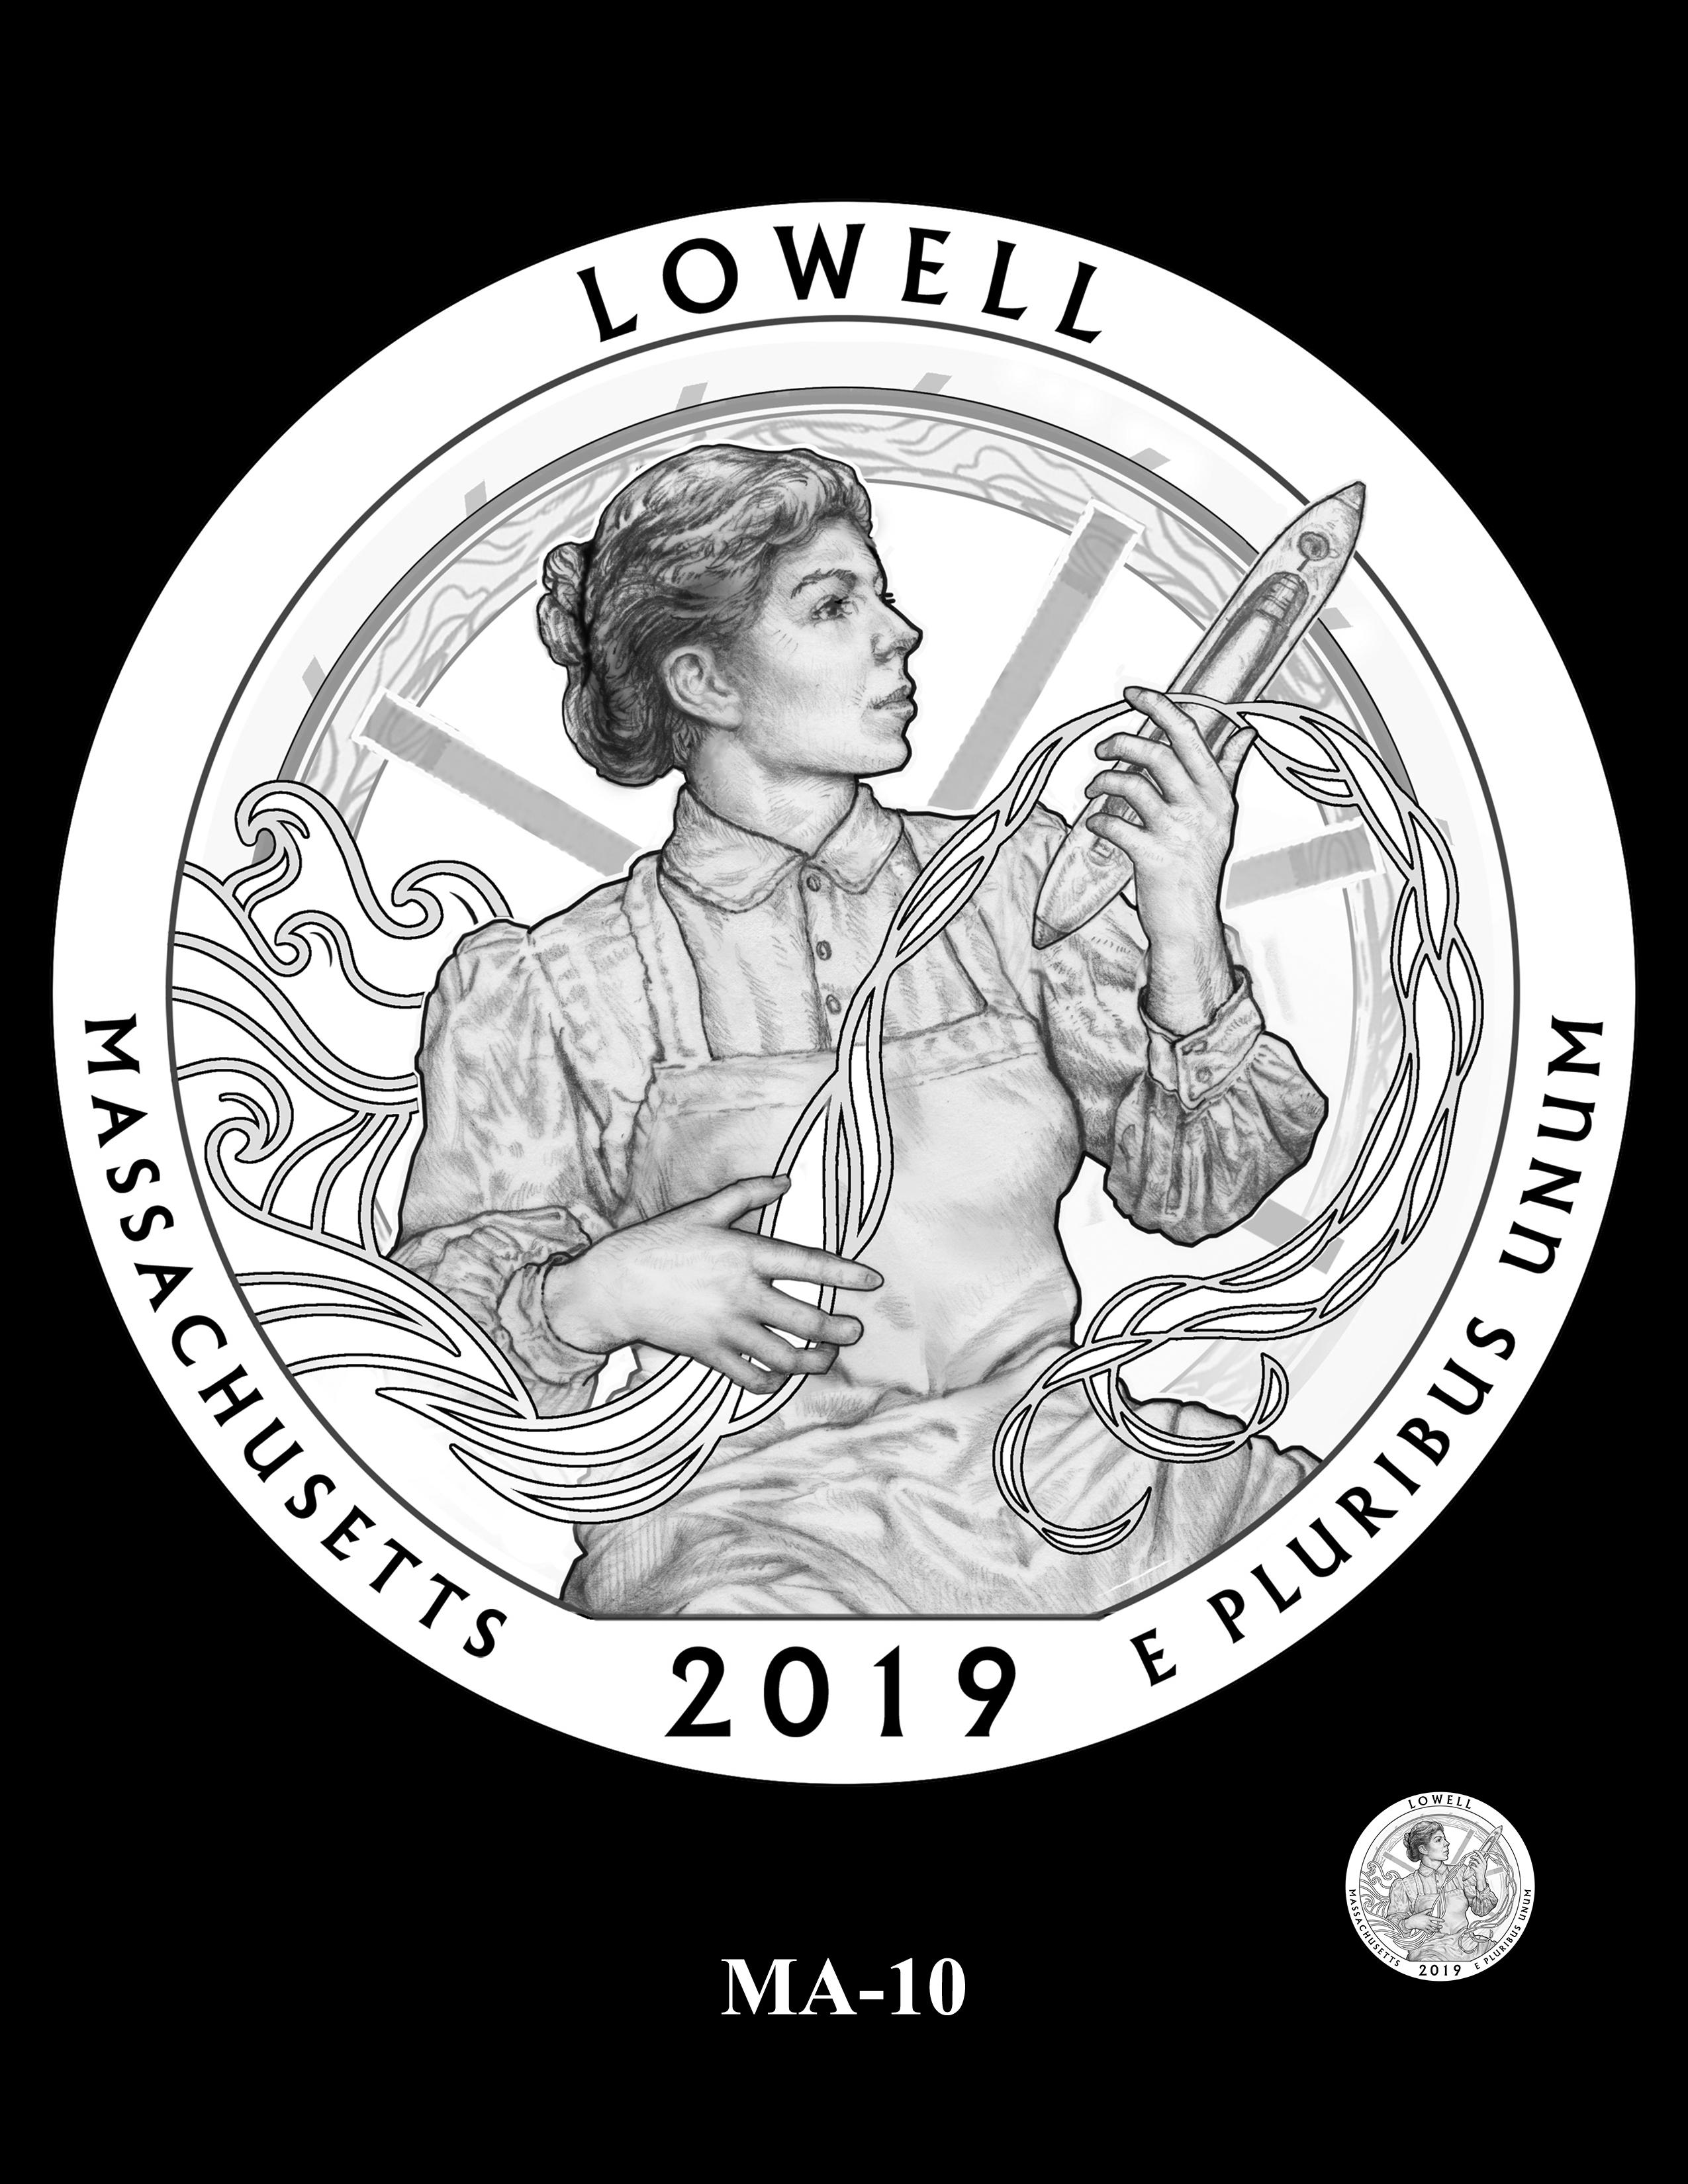 MA-10 -- 2019 America the Beautiful Quarters® Program